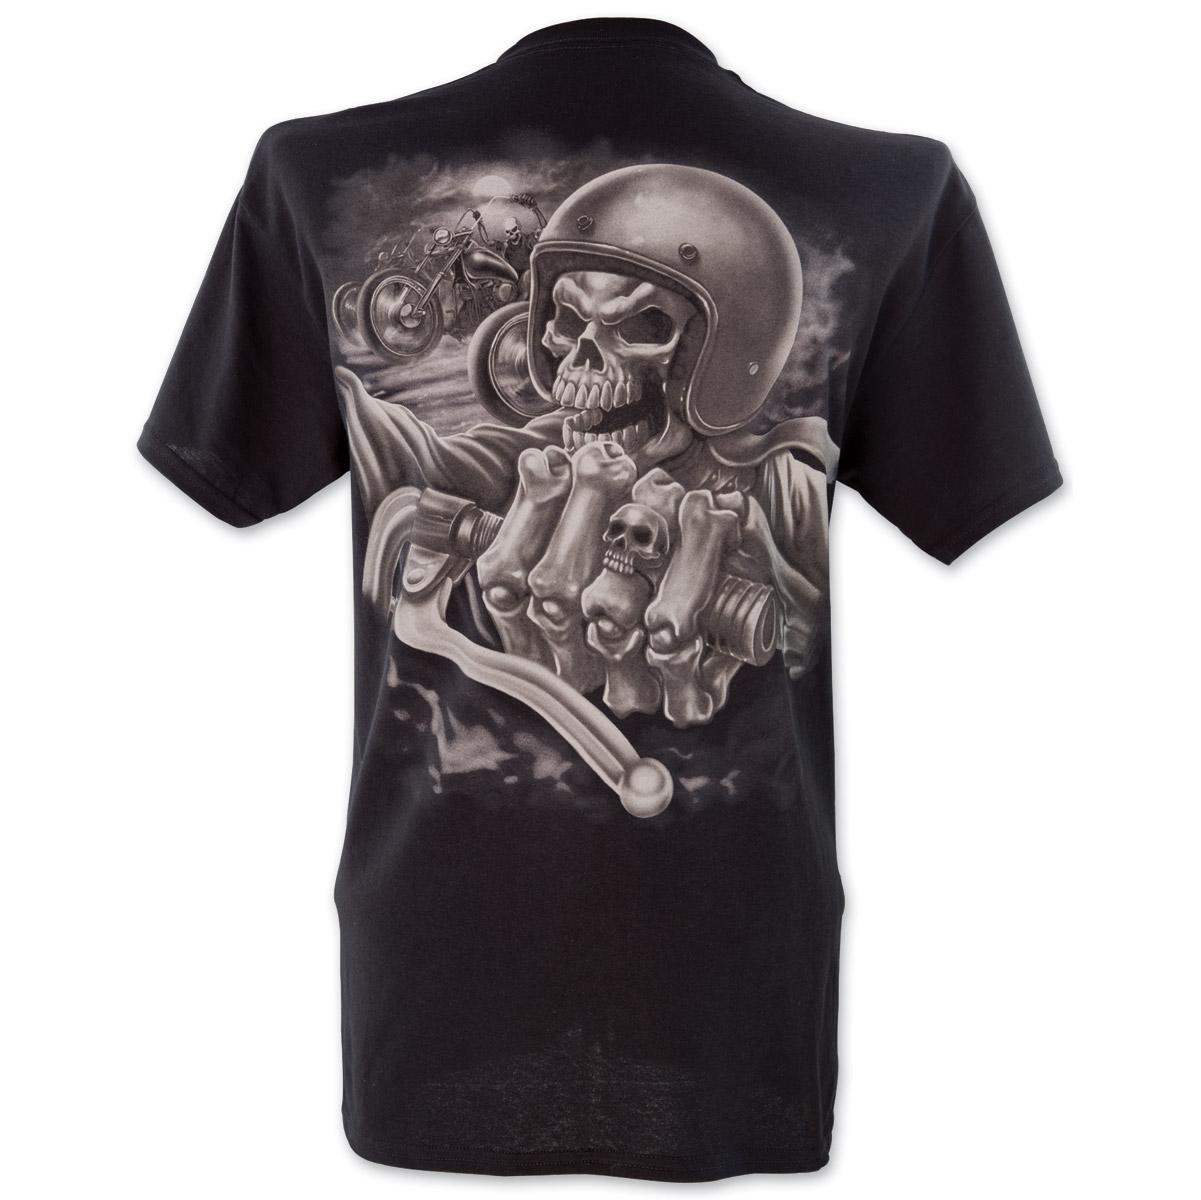 Lethal Threat Skull Crew Black T Shirt 161 508 J P Cycles